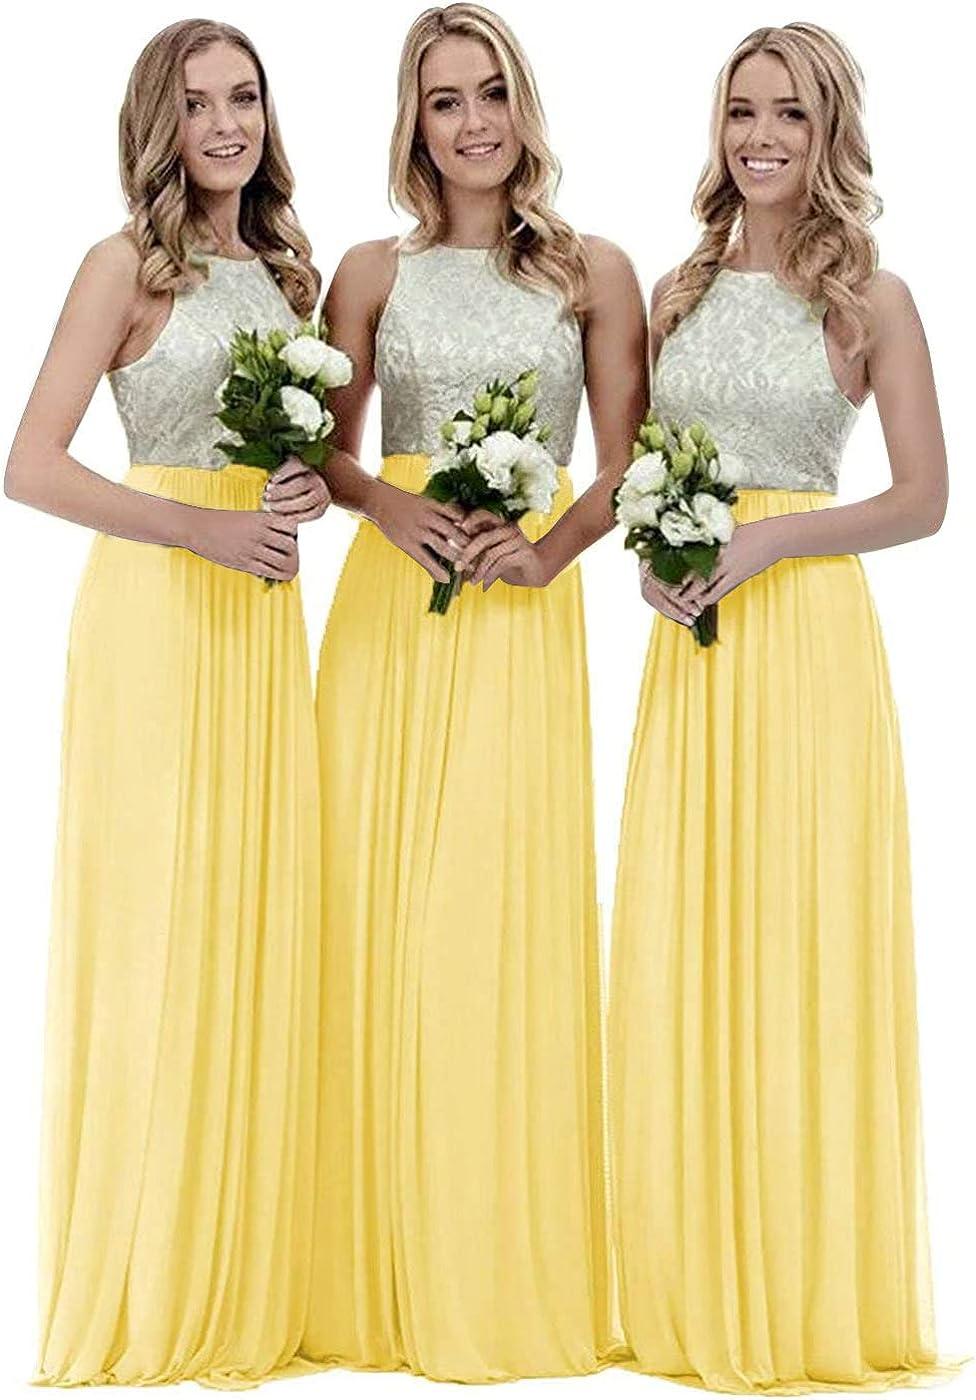 Women's Lace Bodice Chiffon Bridesmaid Dresses for Wedding Long Halter Formal Bridesmaids Dress